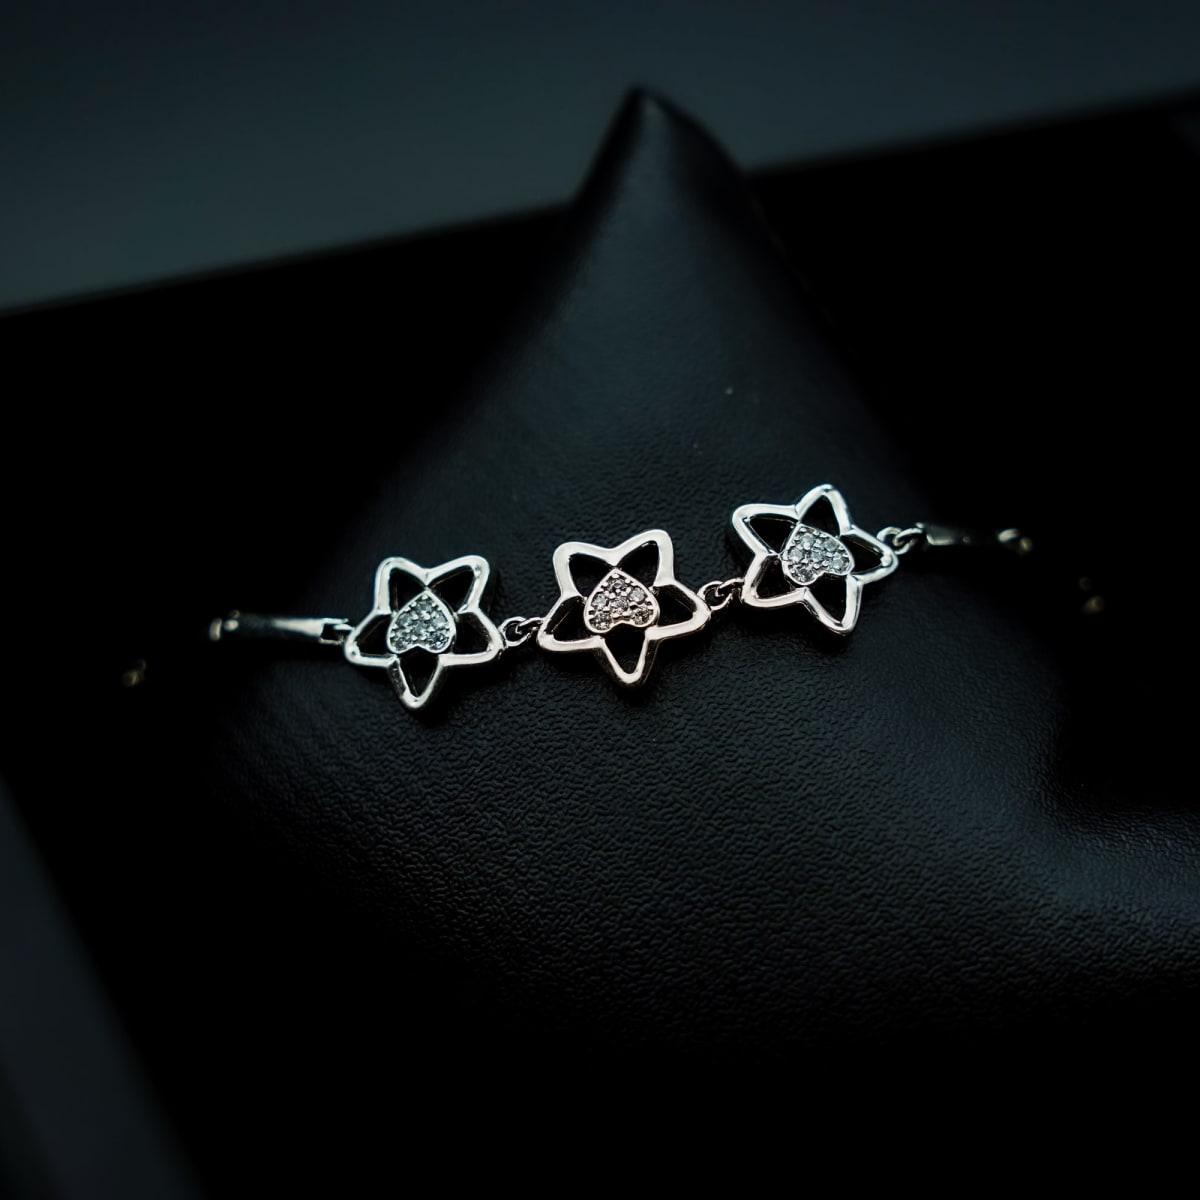 925 Silver Zircon Star Bracelet